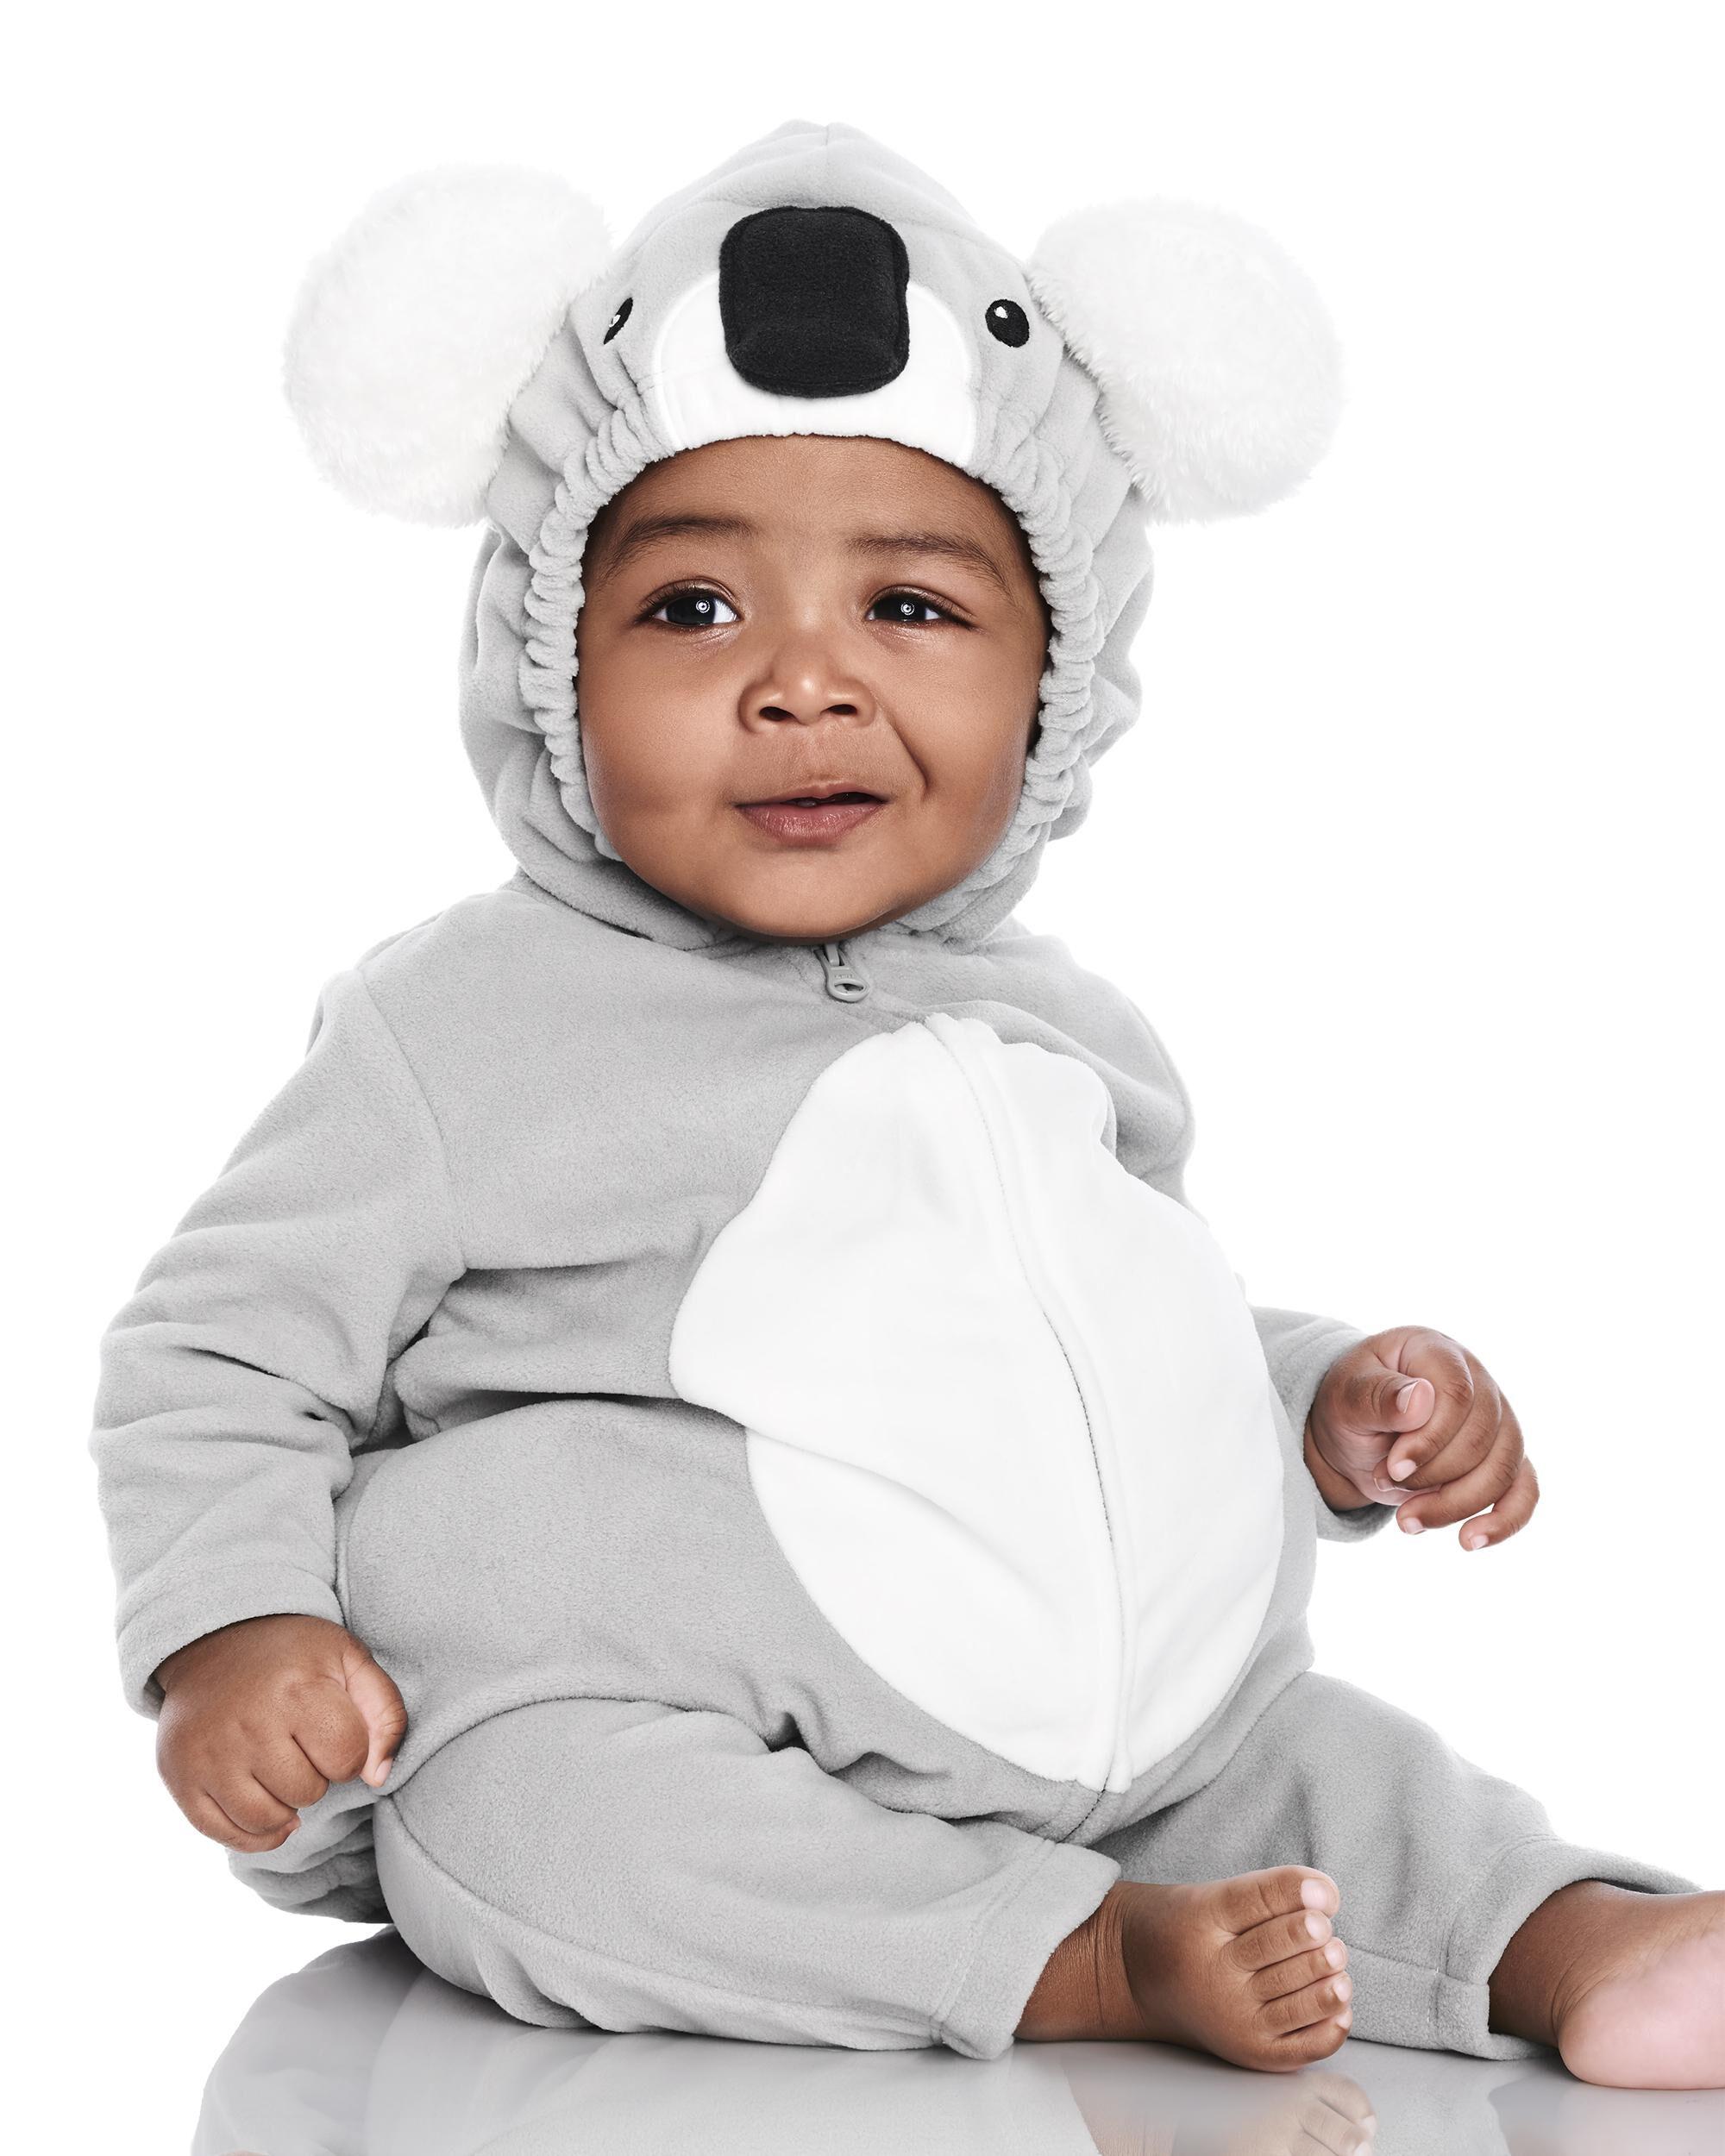 Little Koala Halloween Costume  sc 1 st  Carteru0027s & Baby Boy Halloween Costumes u0026 Outfits | Carteru0027s | Free Shipping